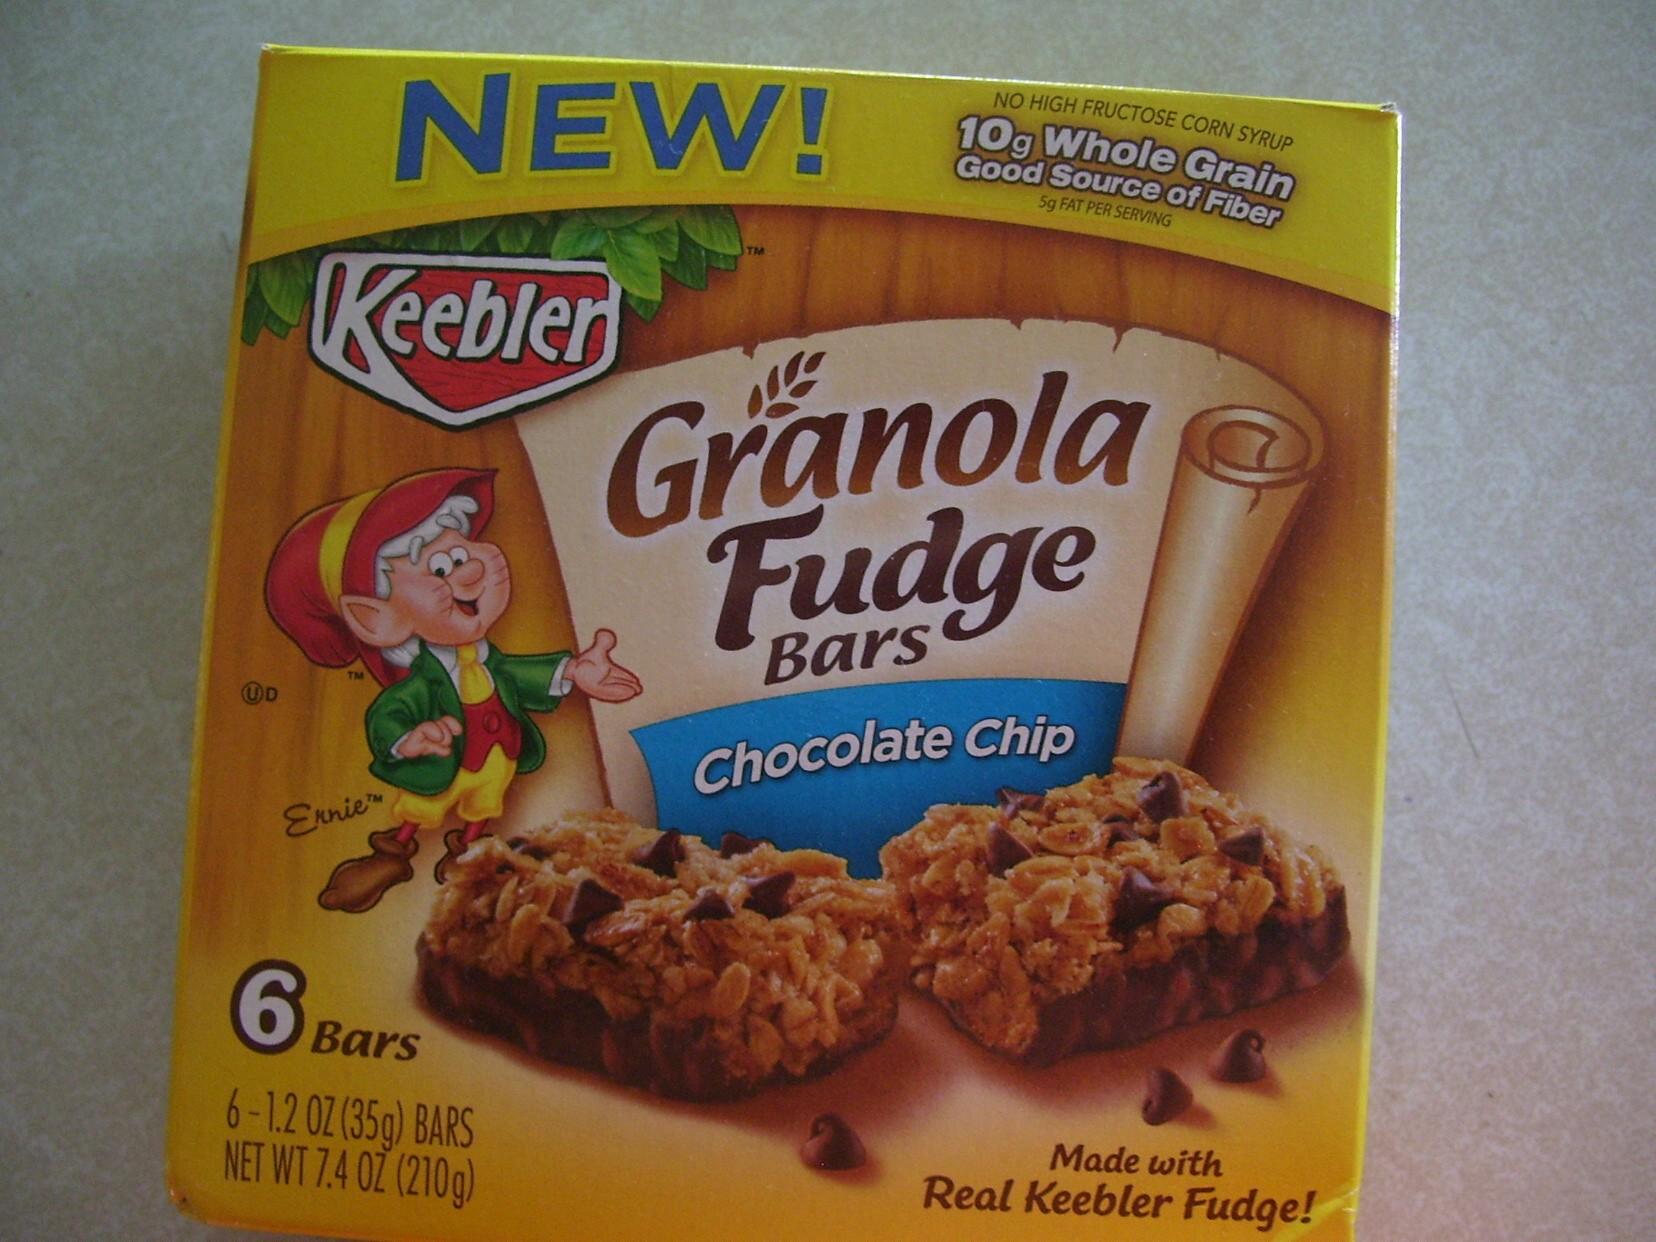 Snack Break:  Keebler Granola Fudge Bars